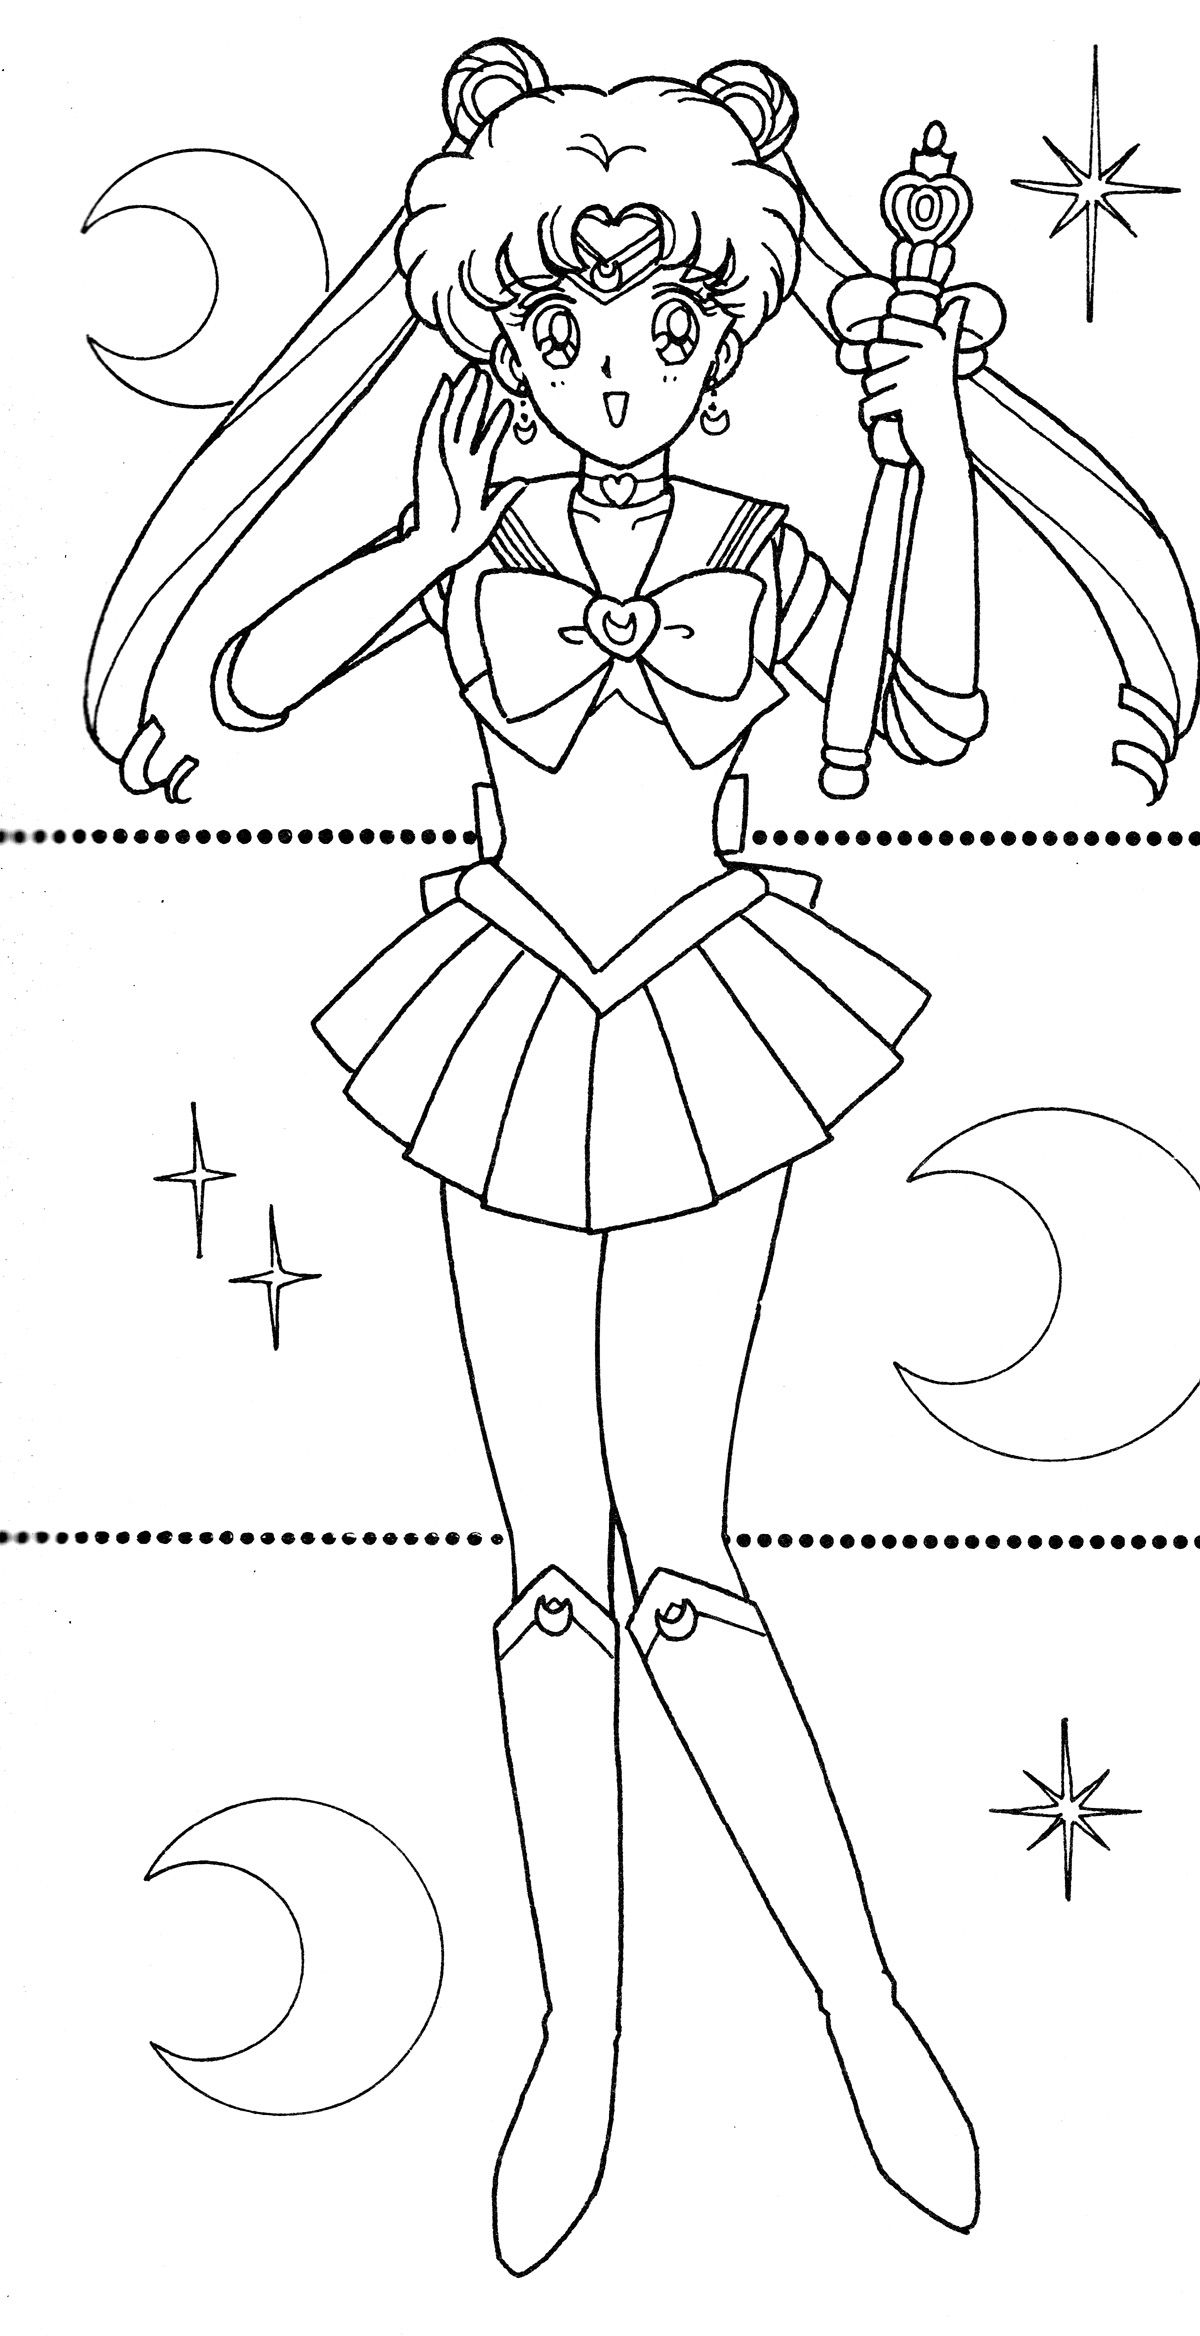 Moon006 Jpg 1200 2336 Sailor Moon Coloring Pages Sailor Moon Crafts Sailor Moon Tattoo